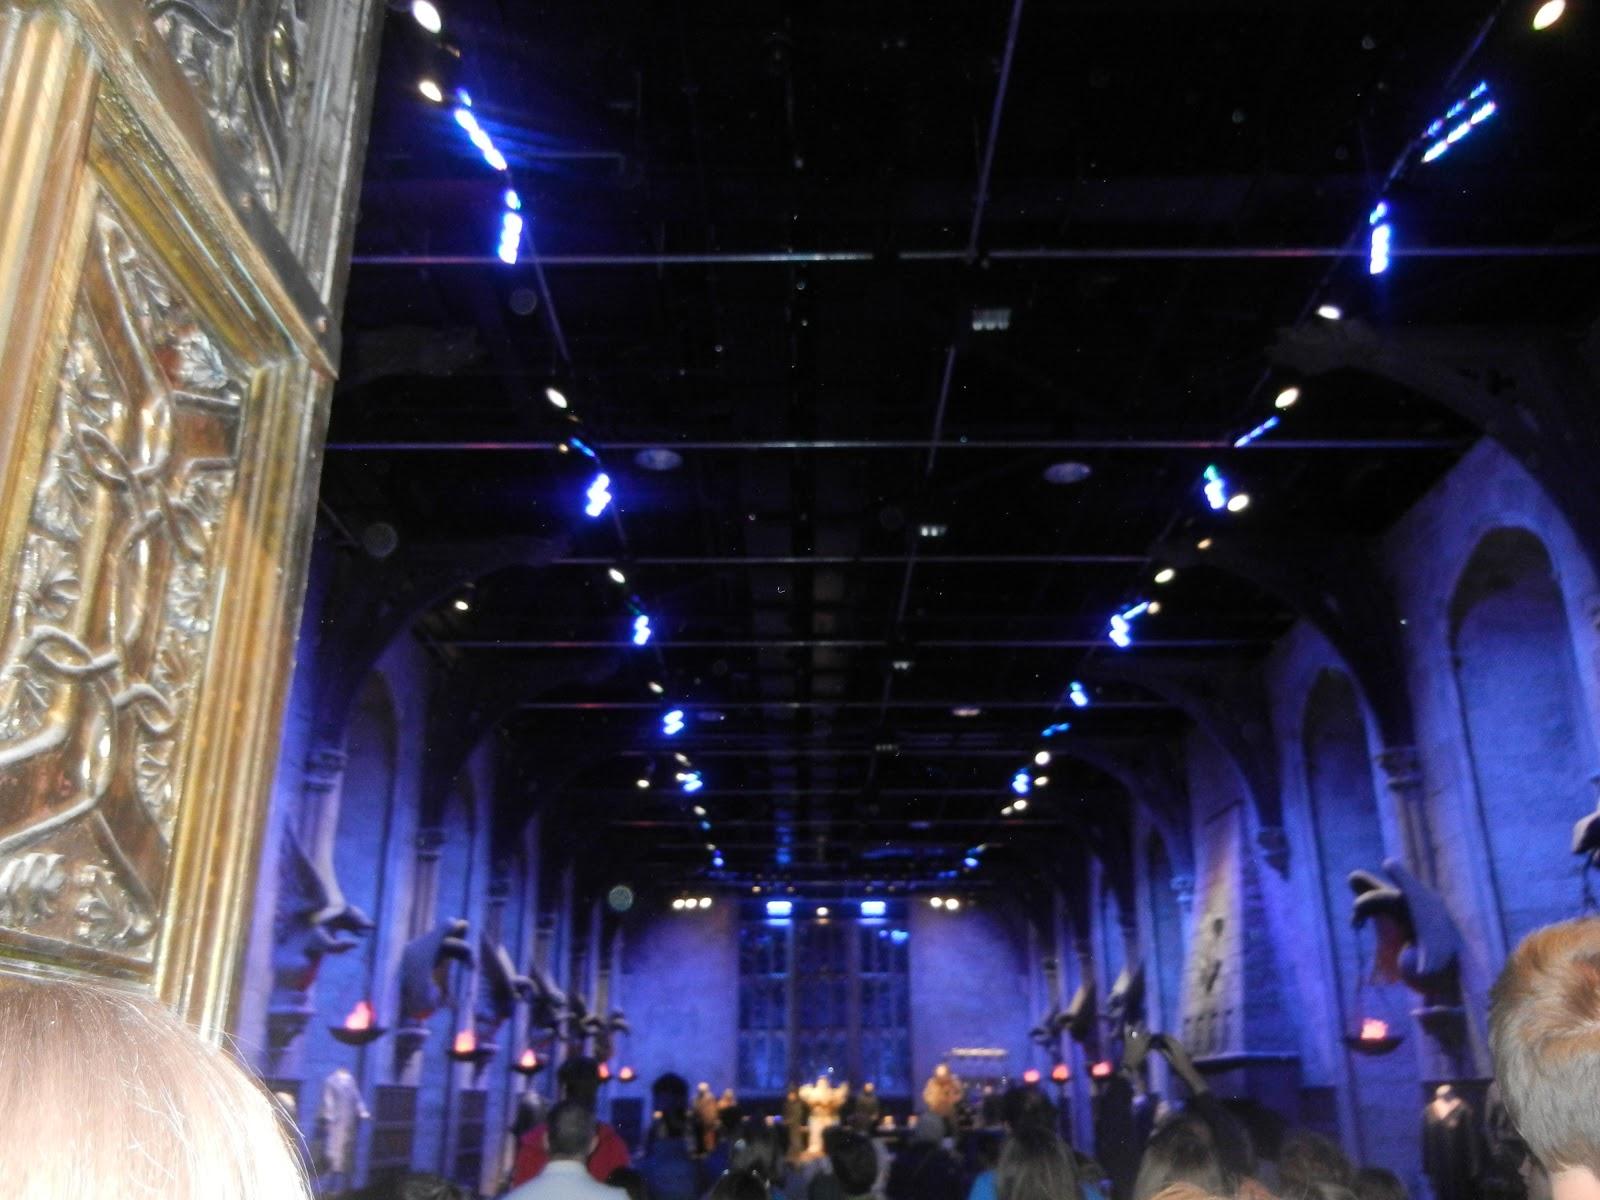 Most Inspiring Wallpaper Harry Potter Dining Hall - DSCN3757  Best Photo Reference_19249.JPG